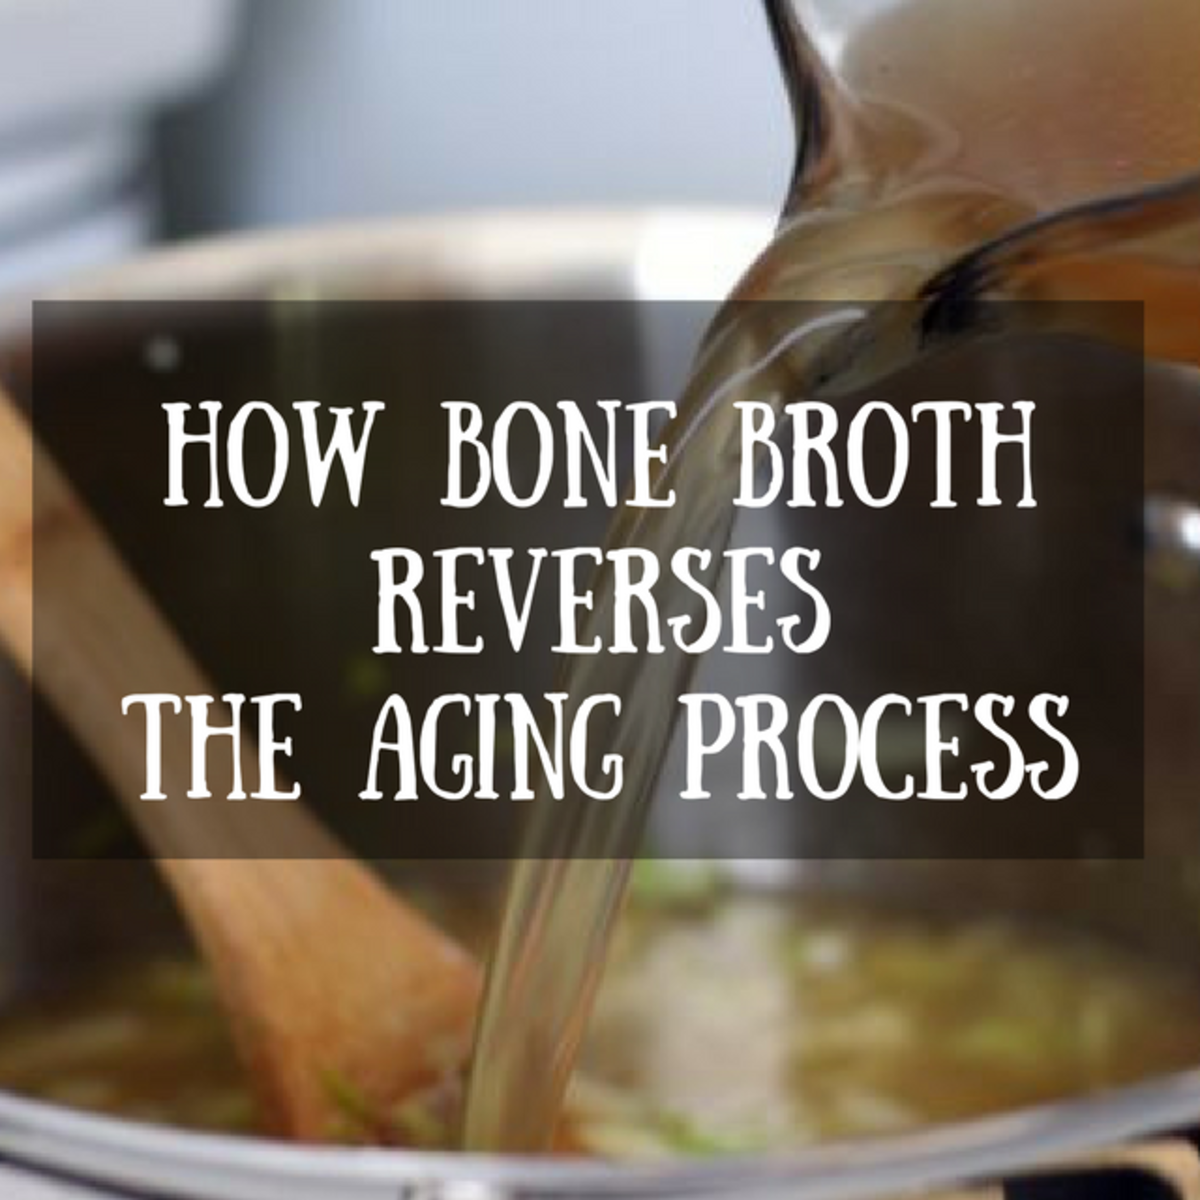 how-bone-broth-reverses-the-aging-process